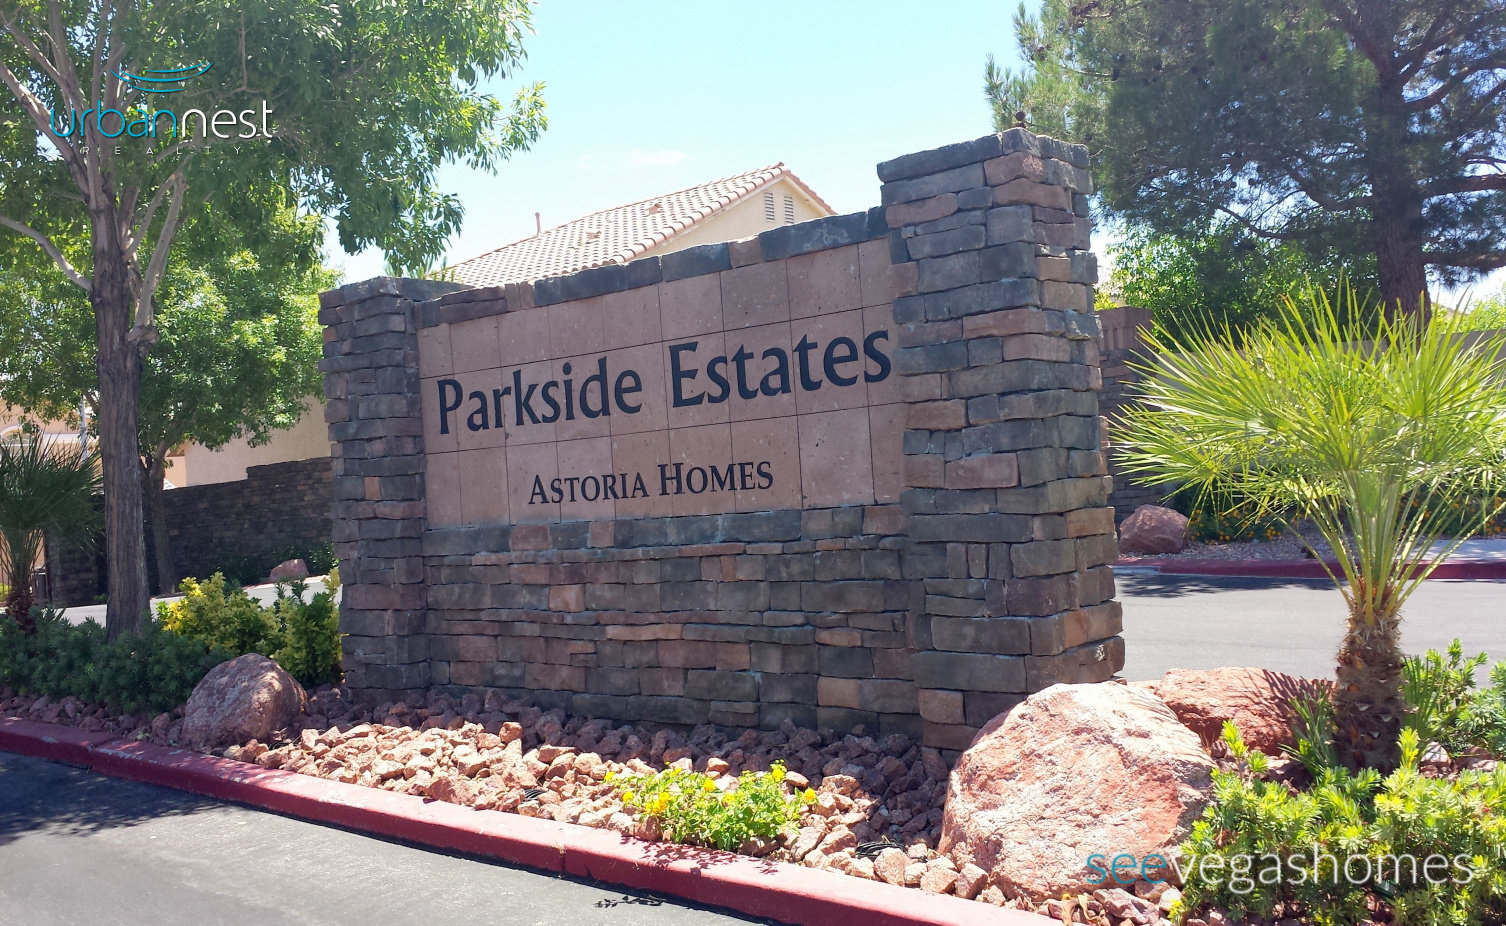 Parkside_Estates_Las_Vegas_NV_89143_SeeVegasHomes